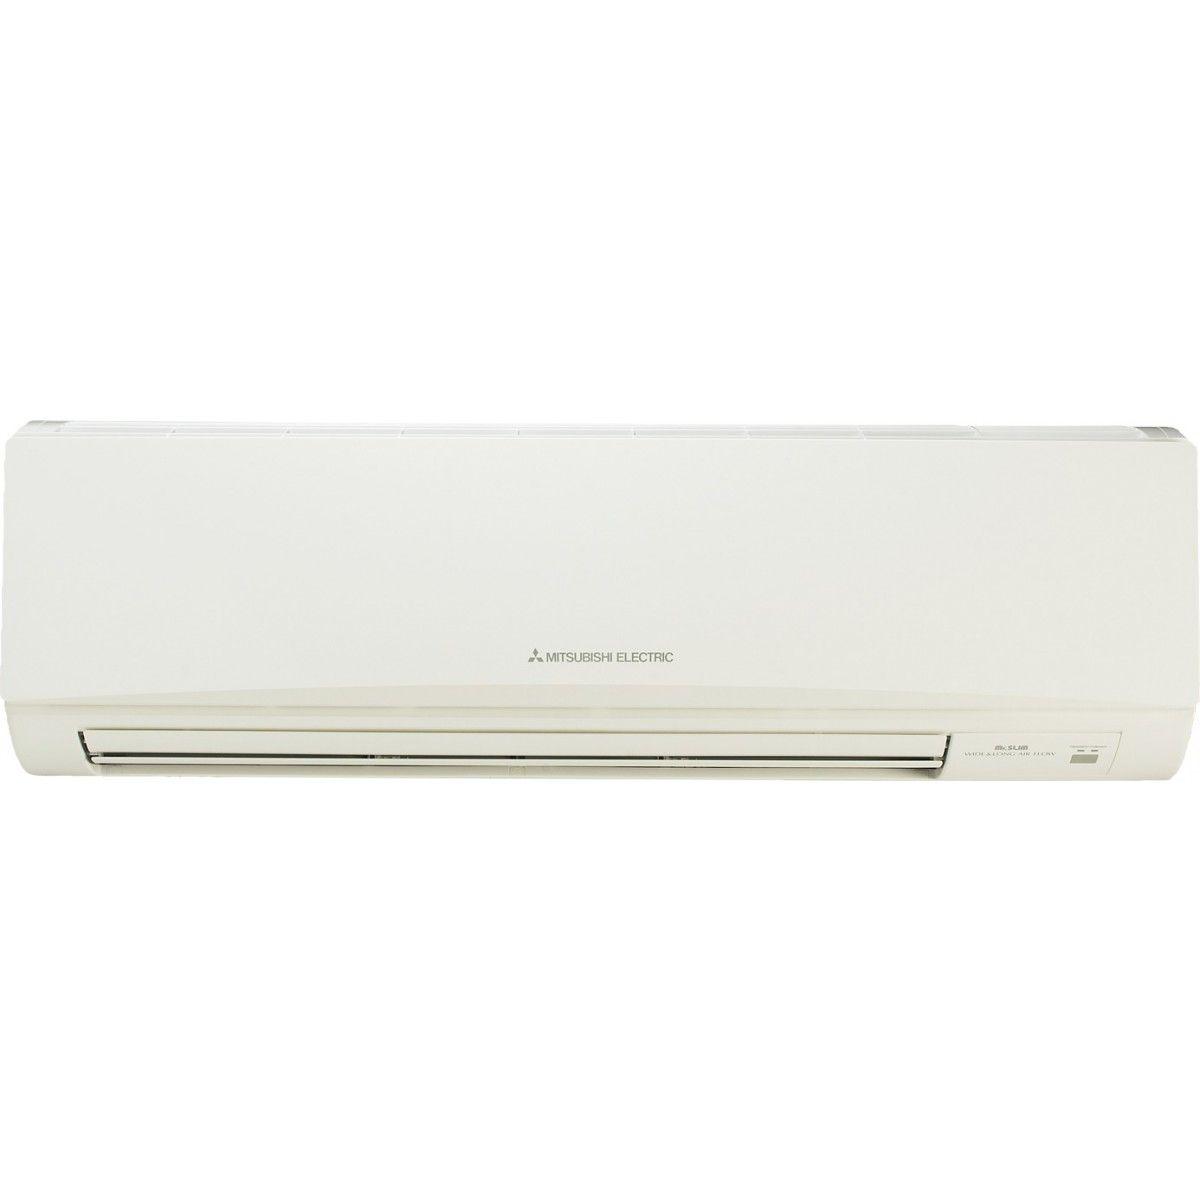 30k btu mitsubishi mszd wall mounted heat pump indoor unit for Indoor unit design